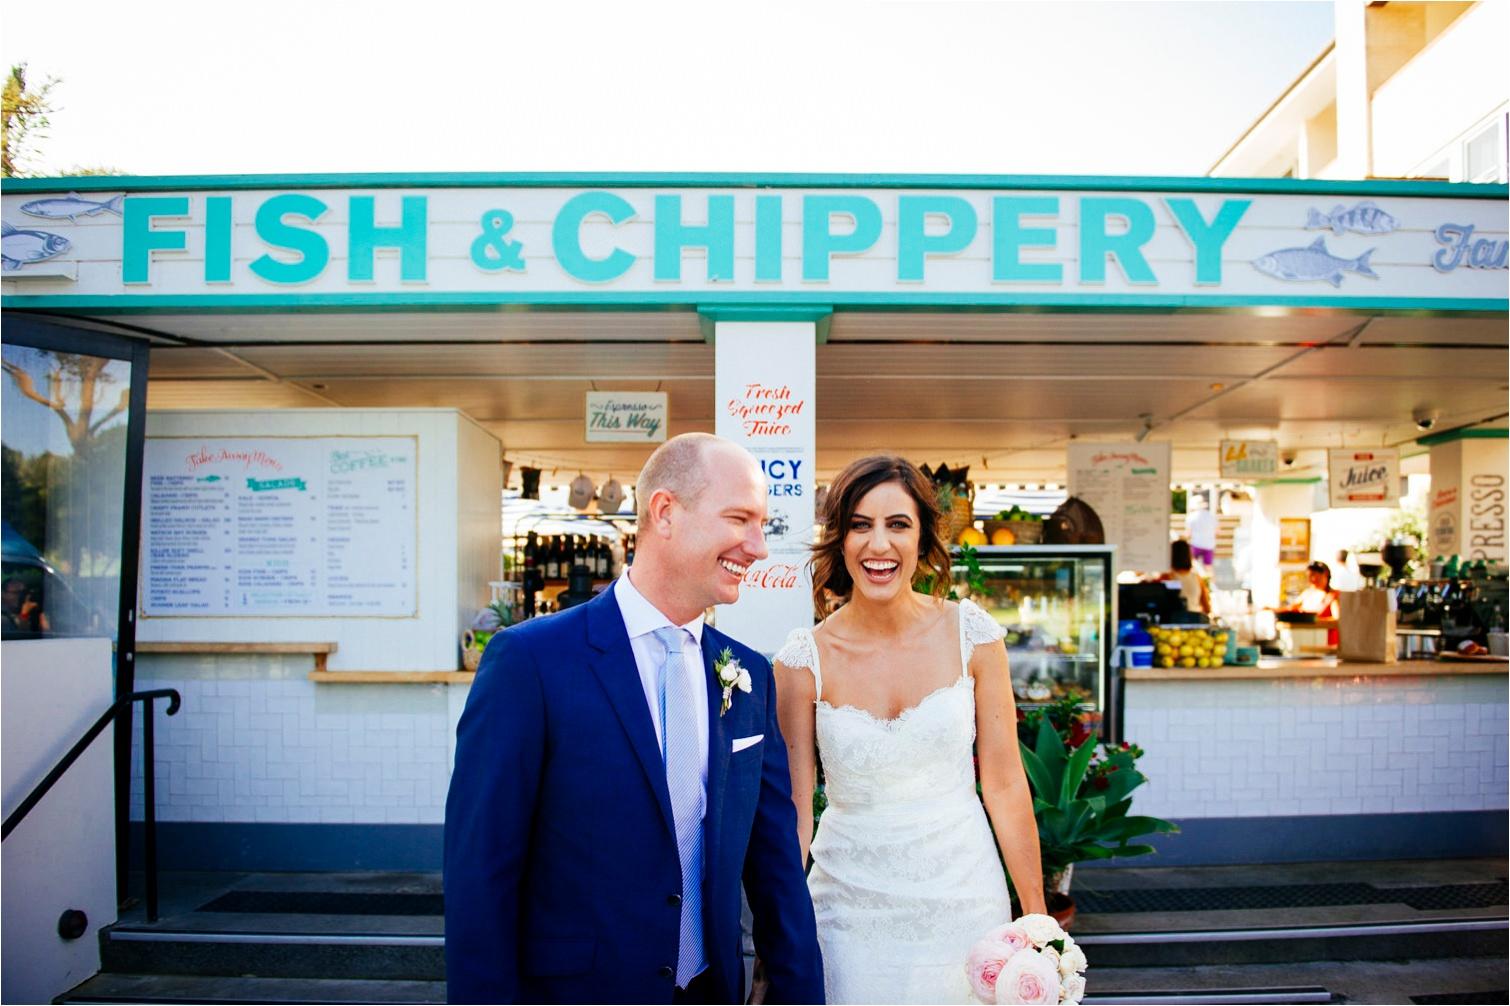 Nicole&Carlie_Watsons_Bay_Hotel_Wedding_by_Gold_Coast_Photographers-The_Follans46.jpg